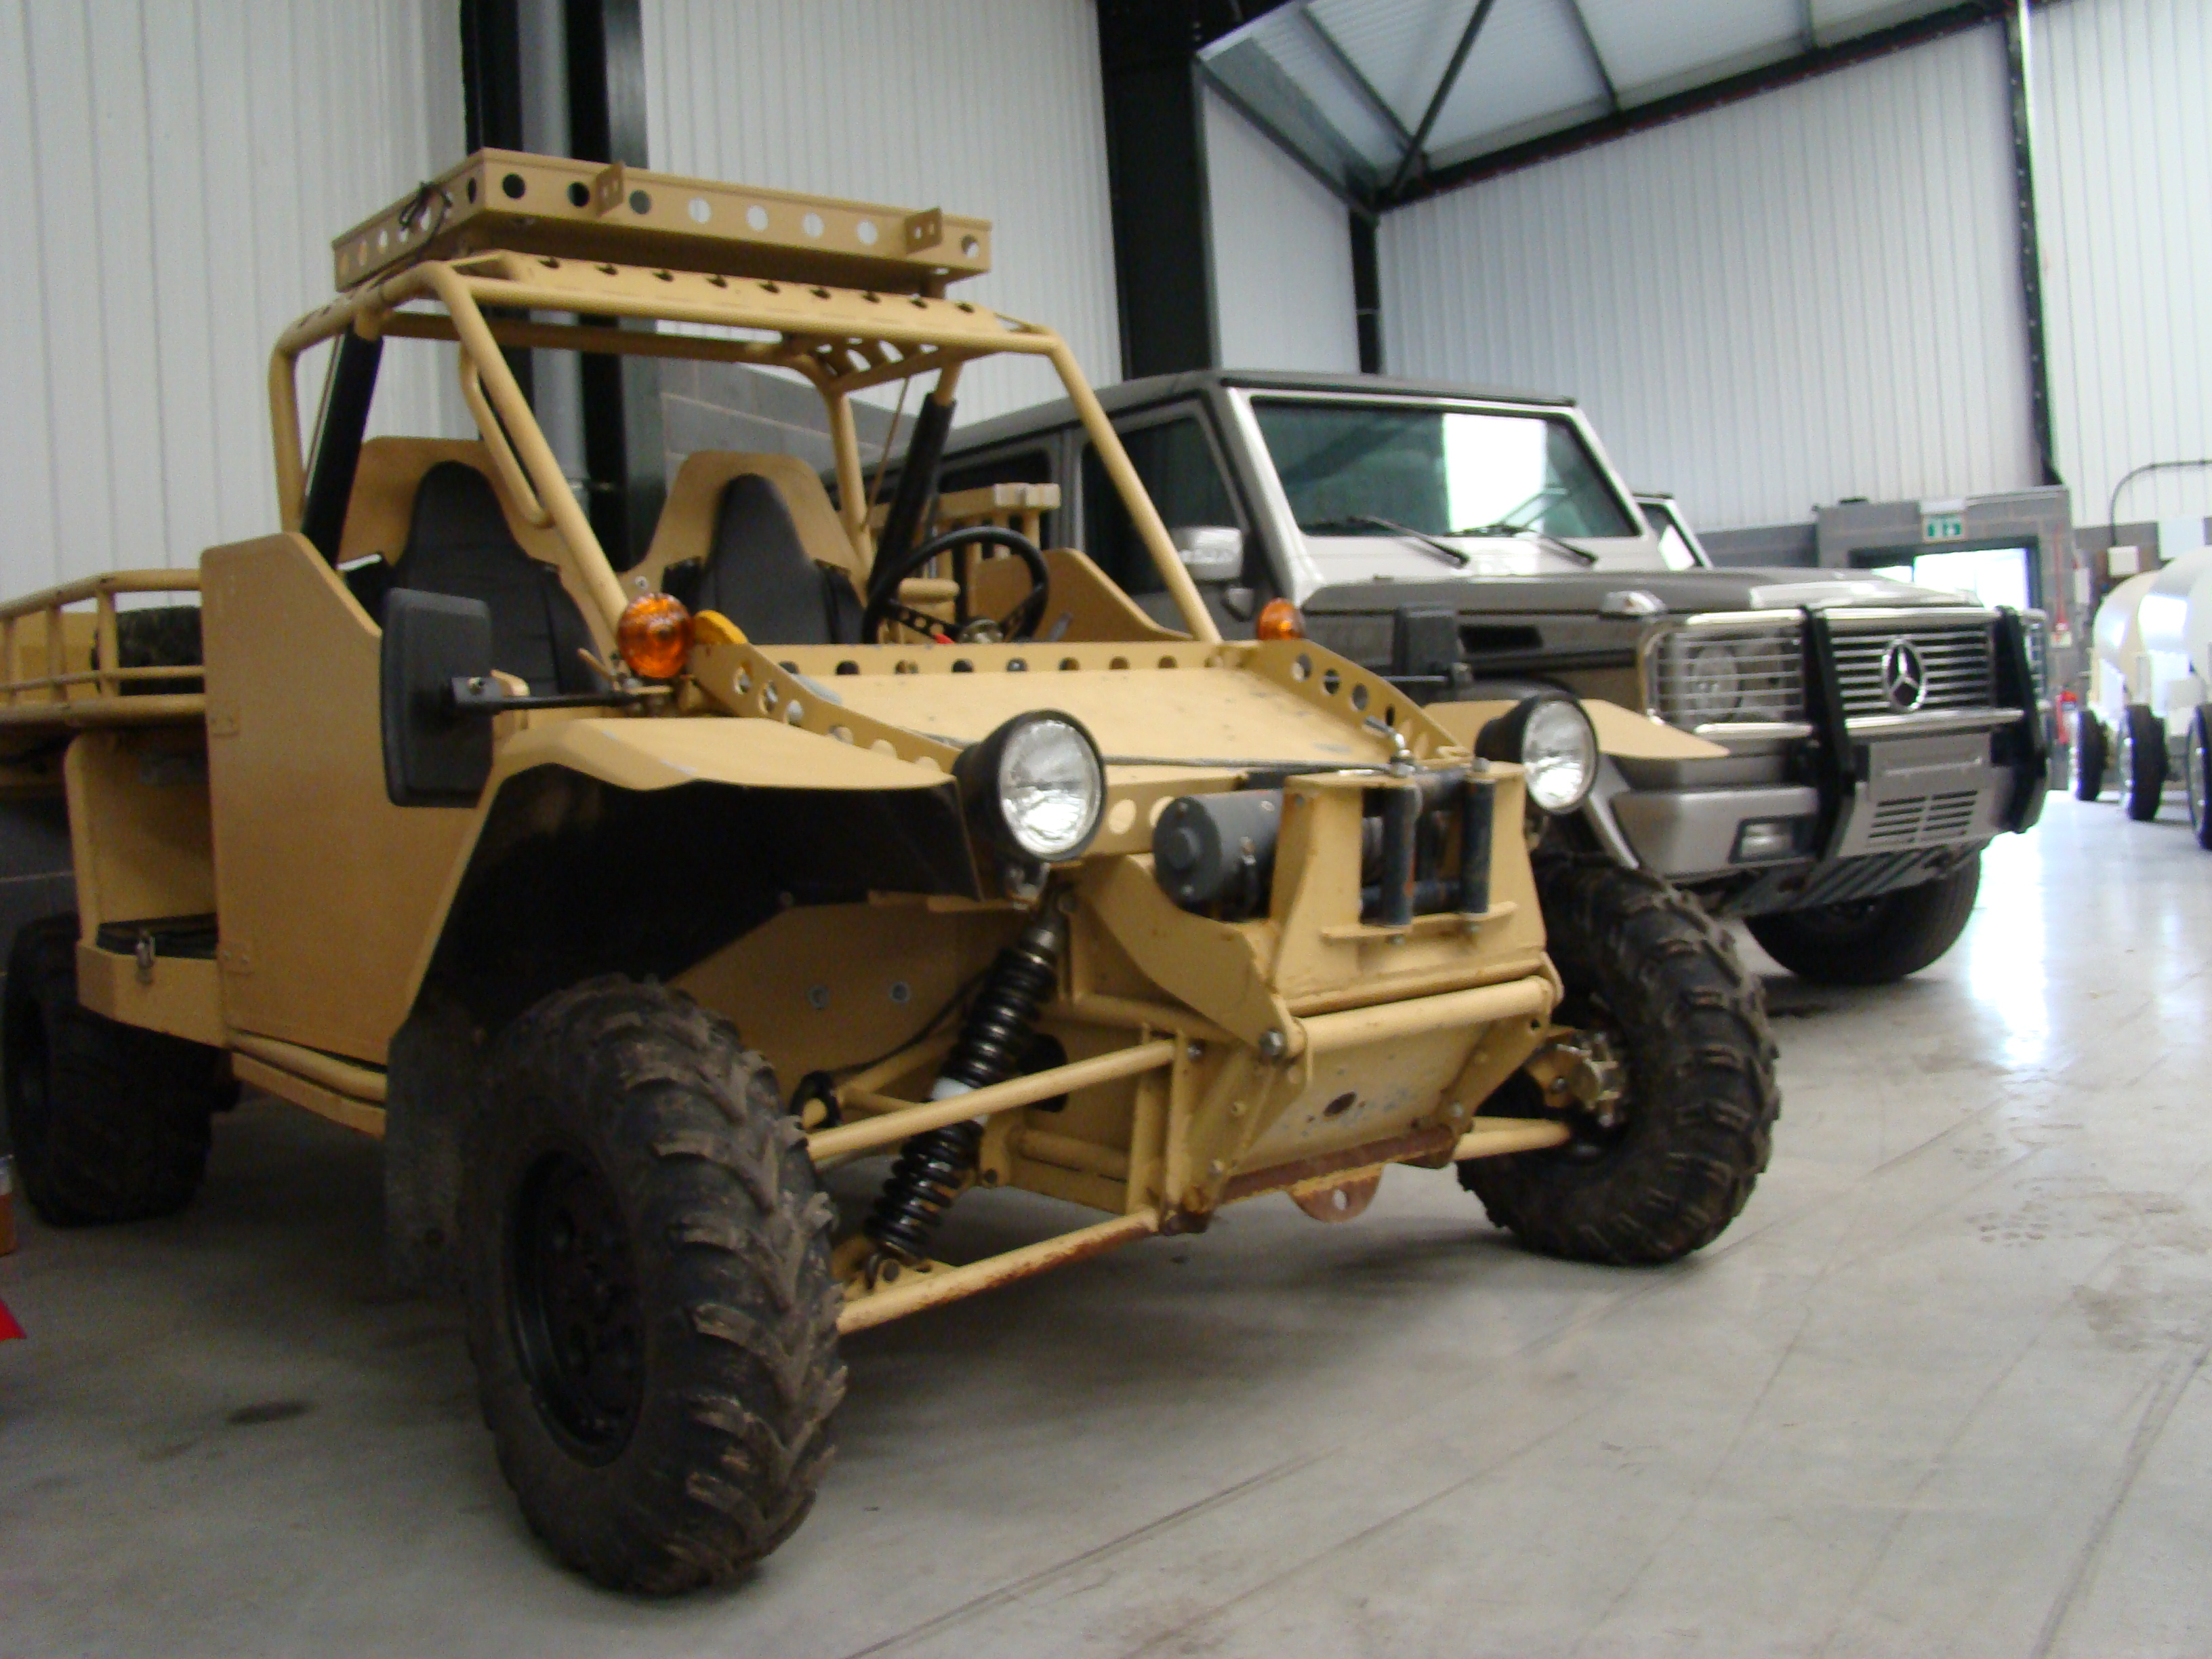 Used Military Surplus Vehicles For Sale Vehicle Ideas